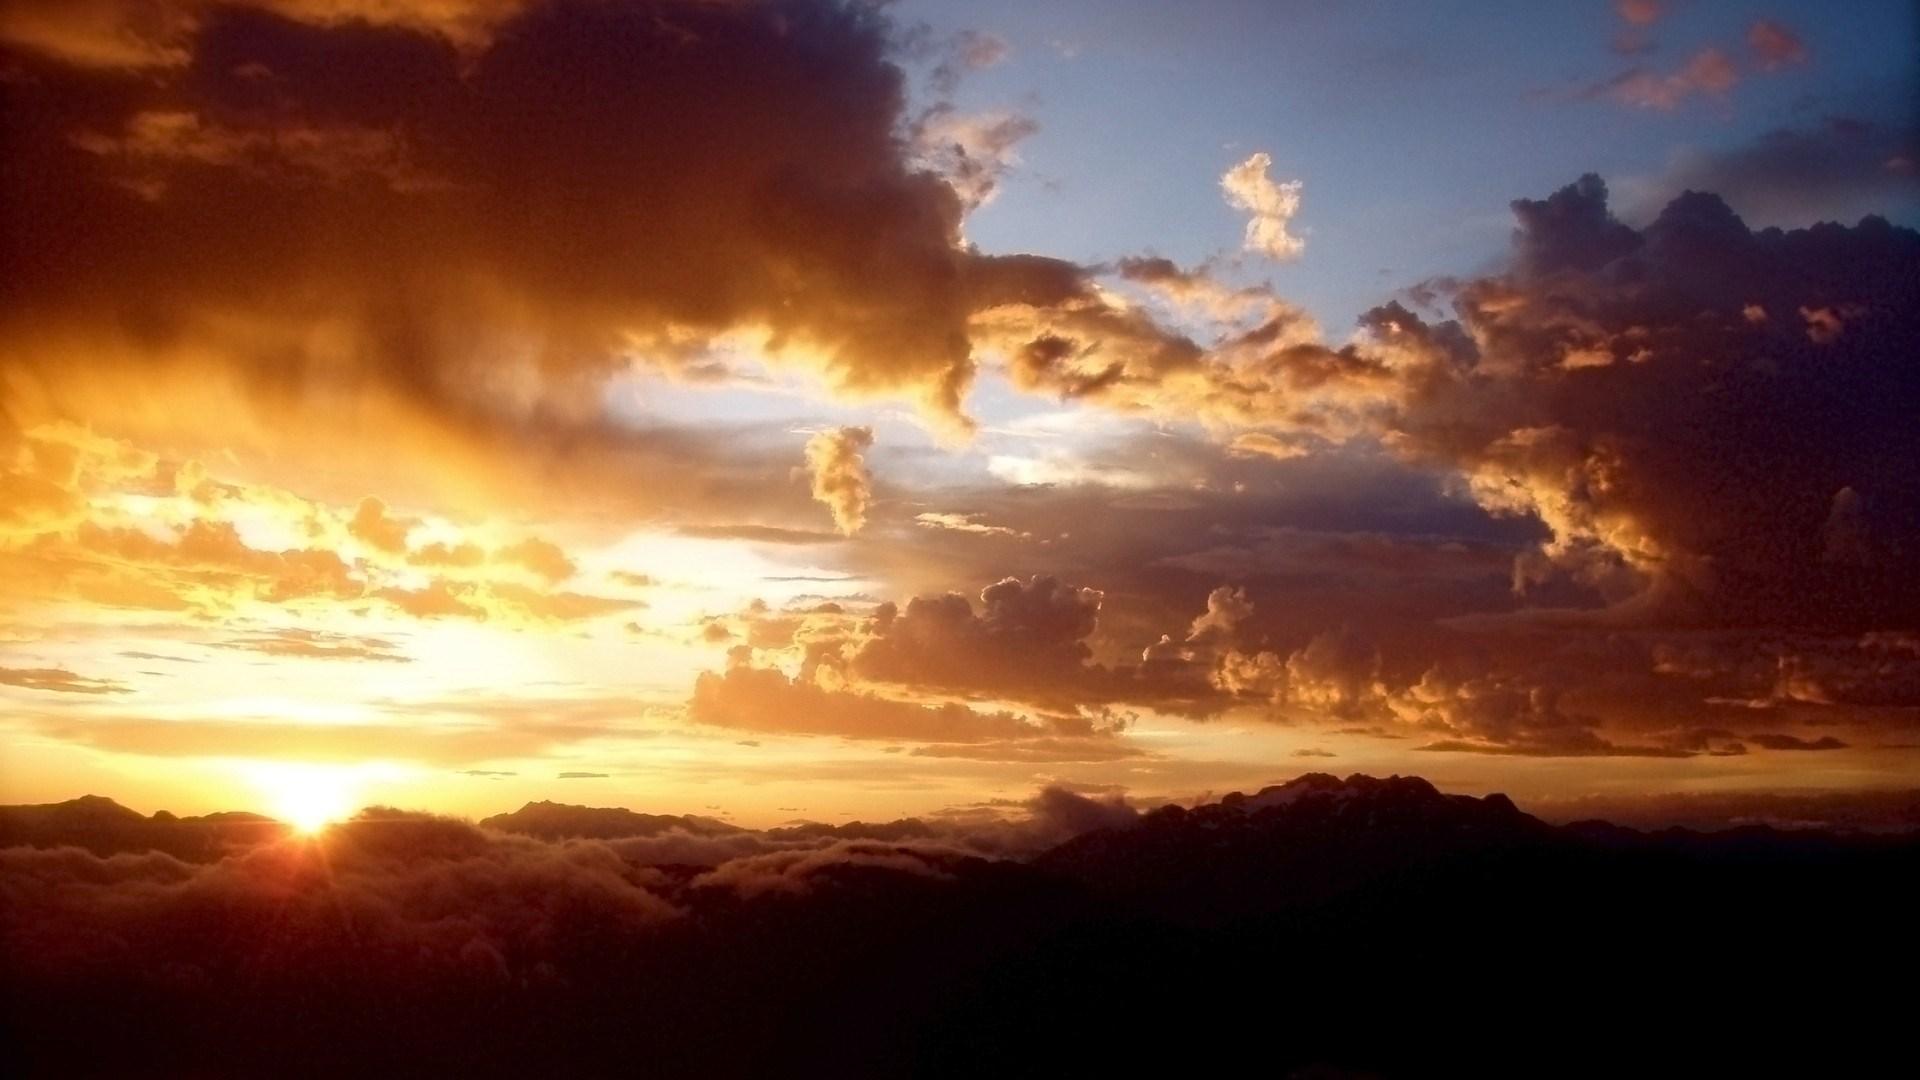 nature sky clouds sunlight color sunset wallpaper [1920x1080]